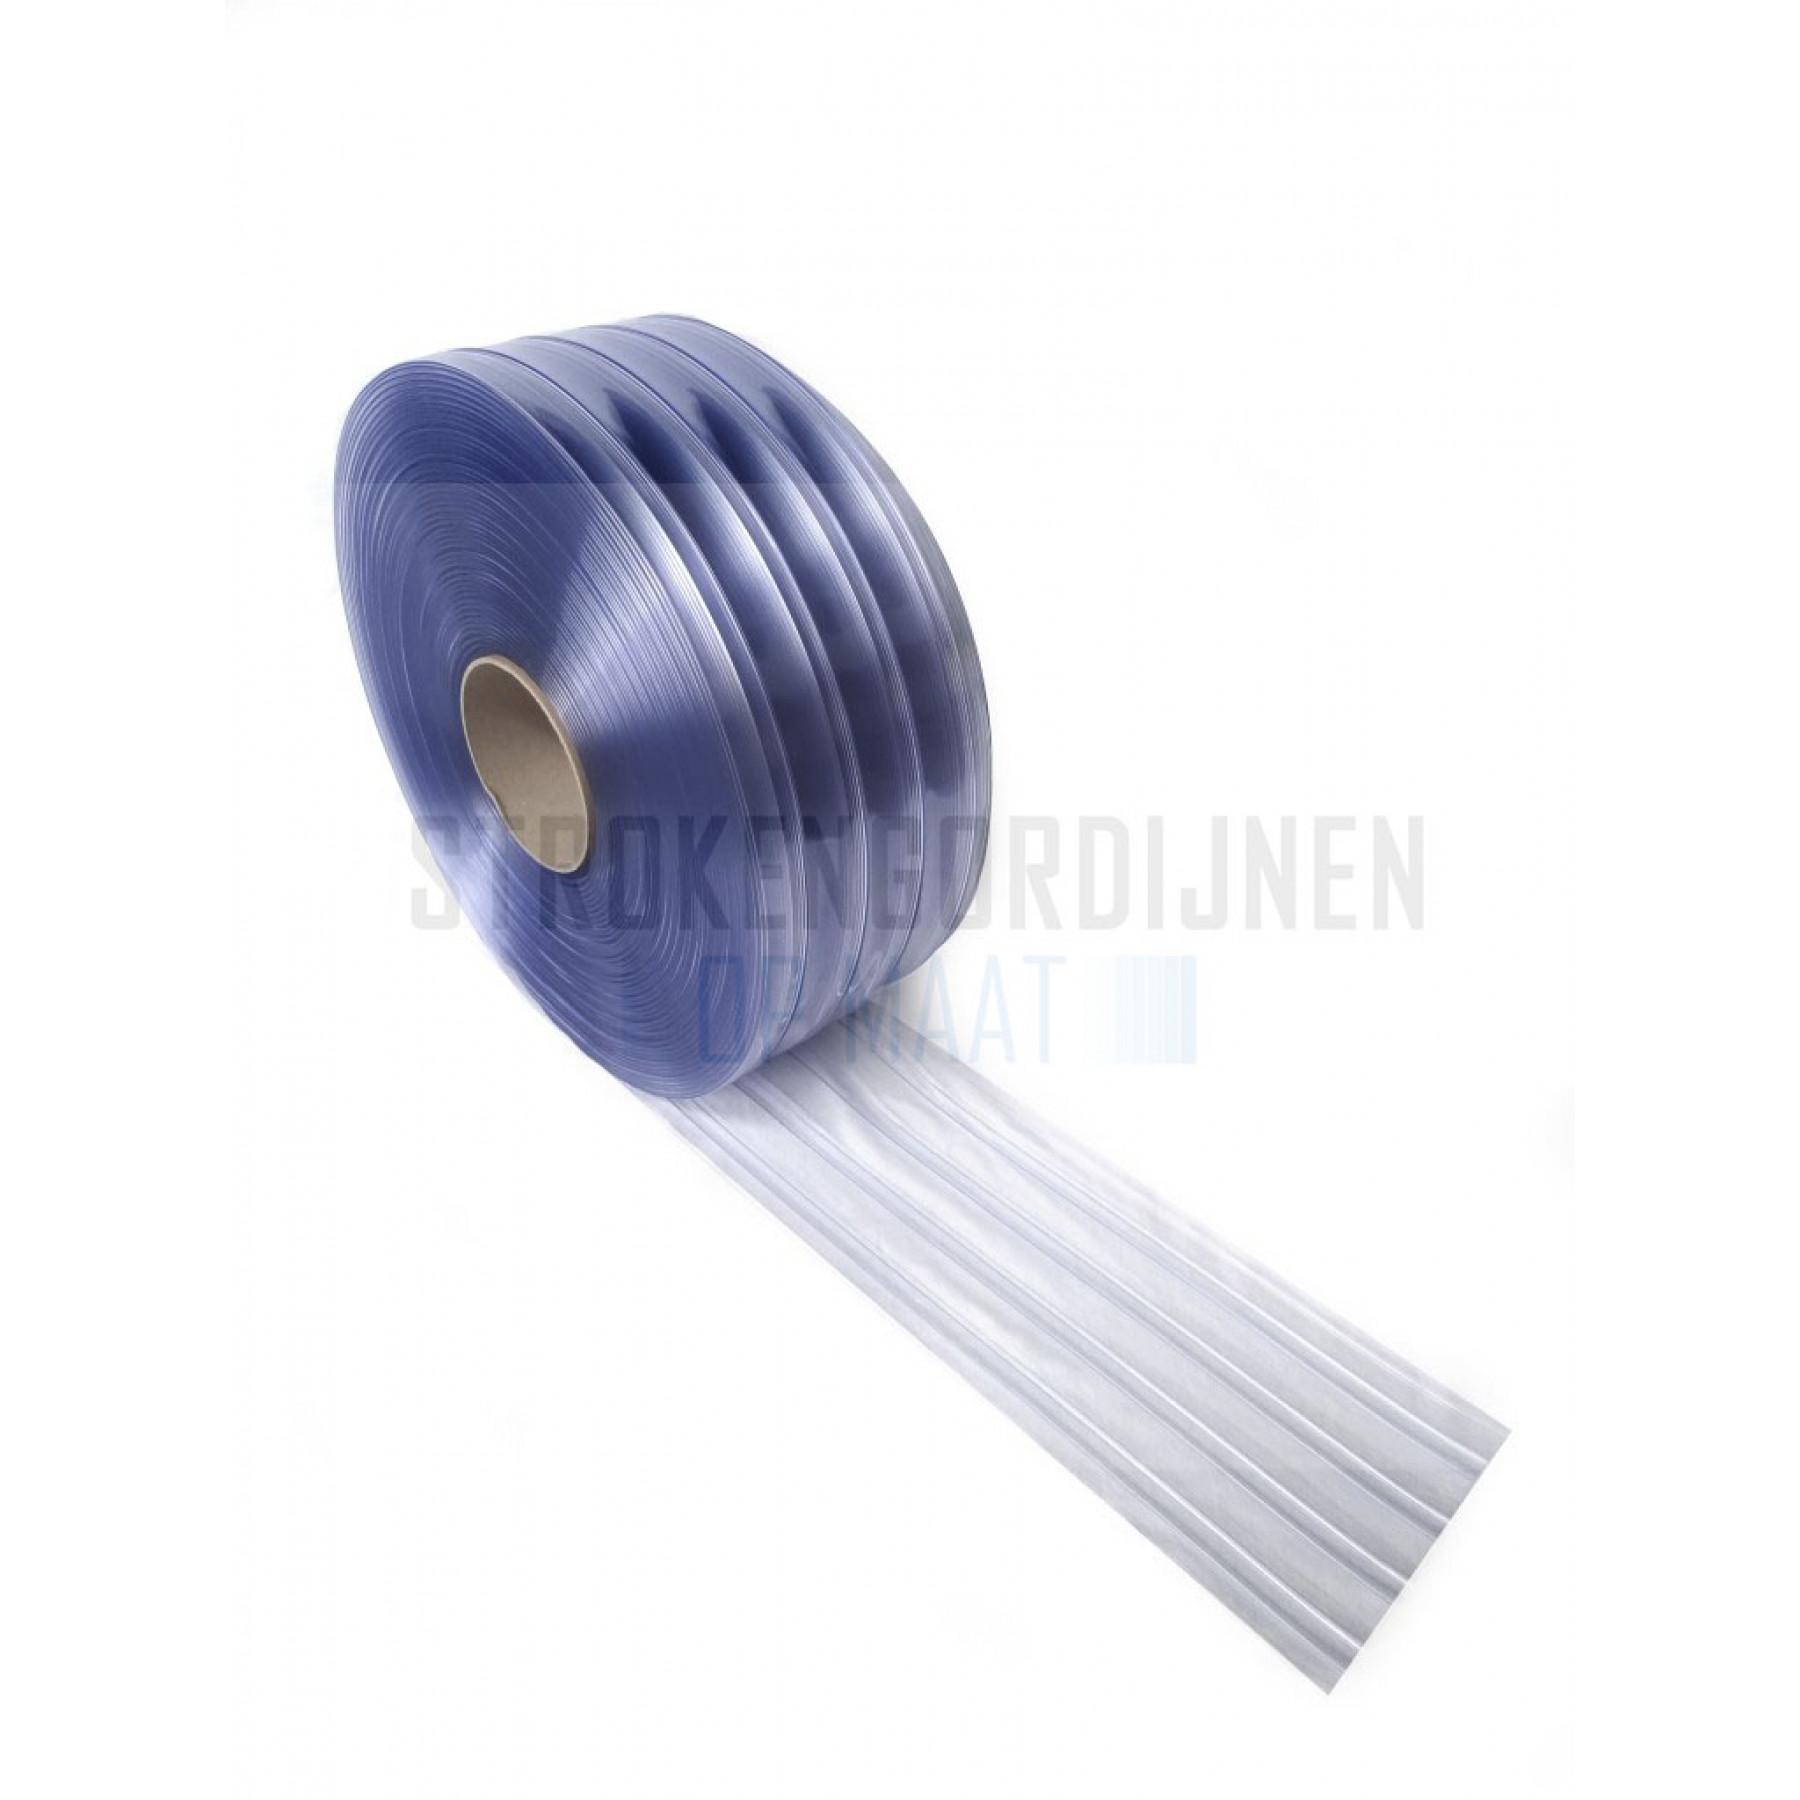 PVC Ribbed Rolle, 300mm breit, 3mm dick, 50 Meter lang, Tiefkühlraum Qualität, transparent